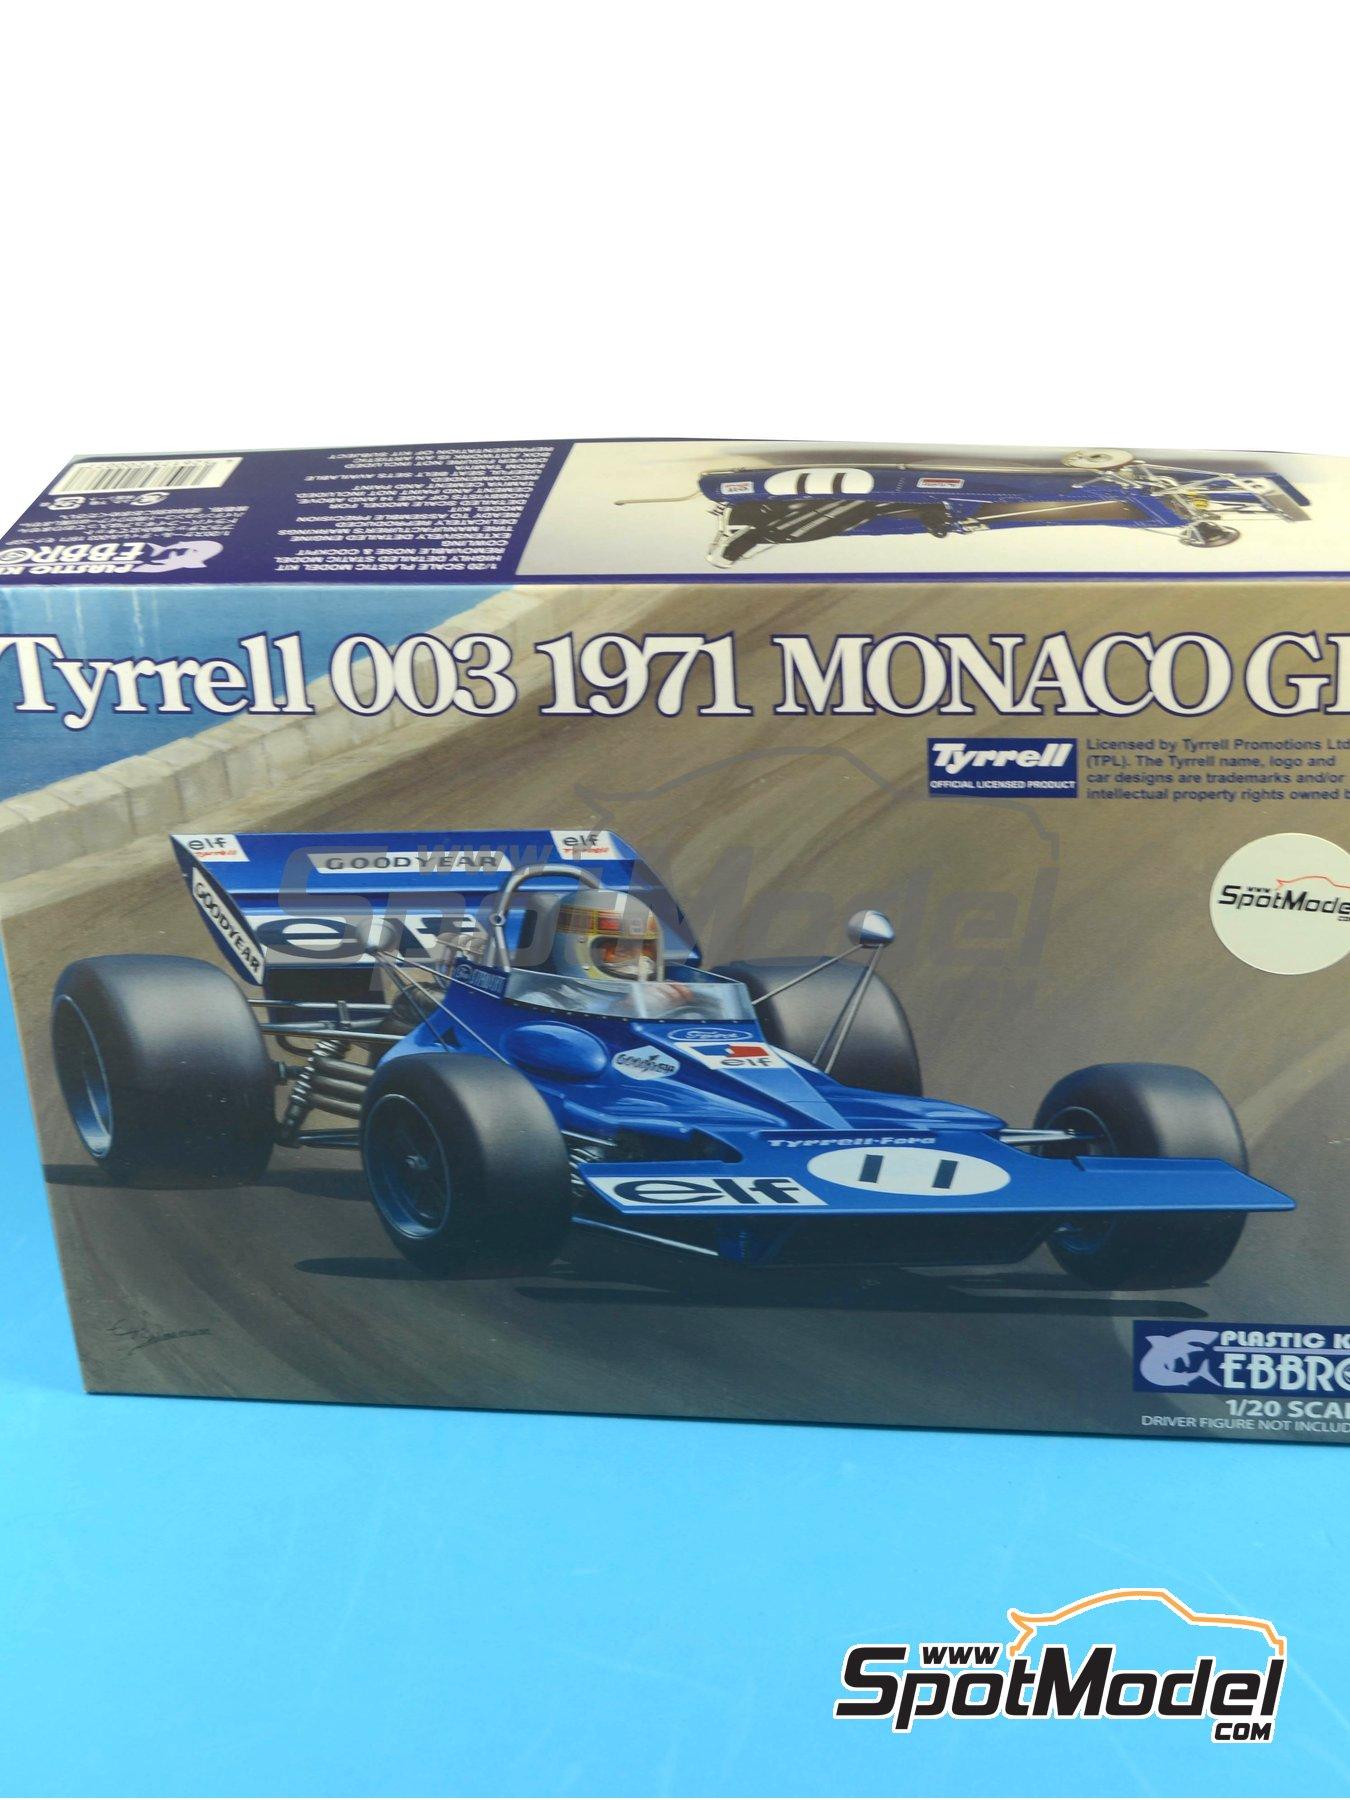 Tyrrell Ford 003 ELF - Spanish Formula 1 Grand Prix, Monaco Formula 1 Grand Prix 1971 | Model car kit in 1/20 scale manufactured by Ebbro (ref.EBR20007, also 20007) image